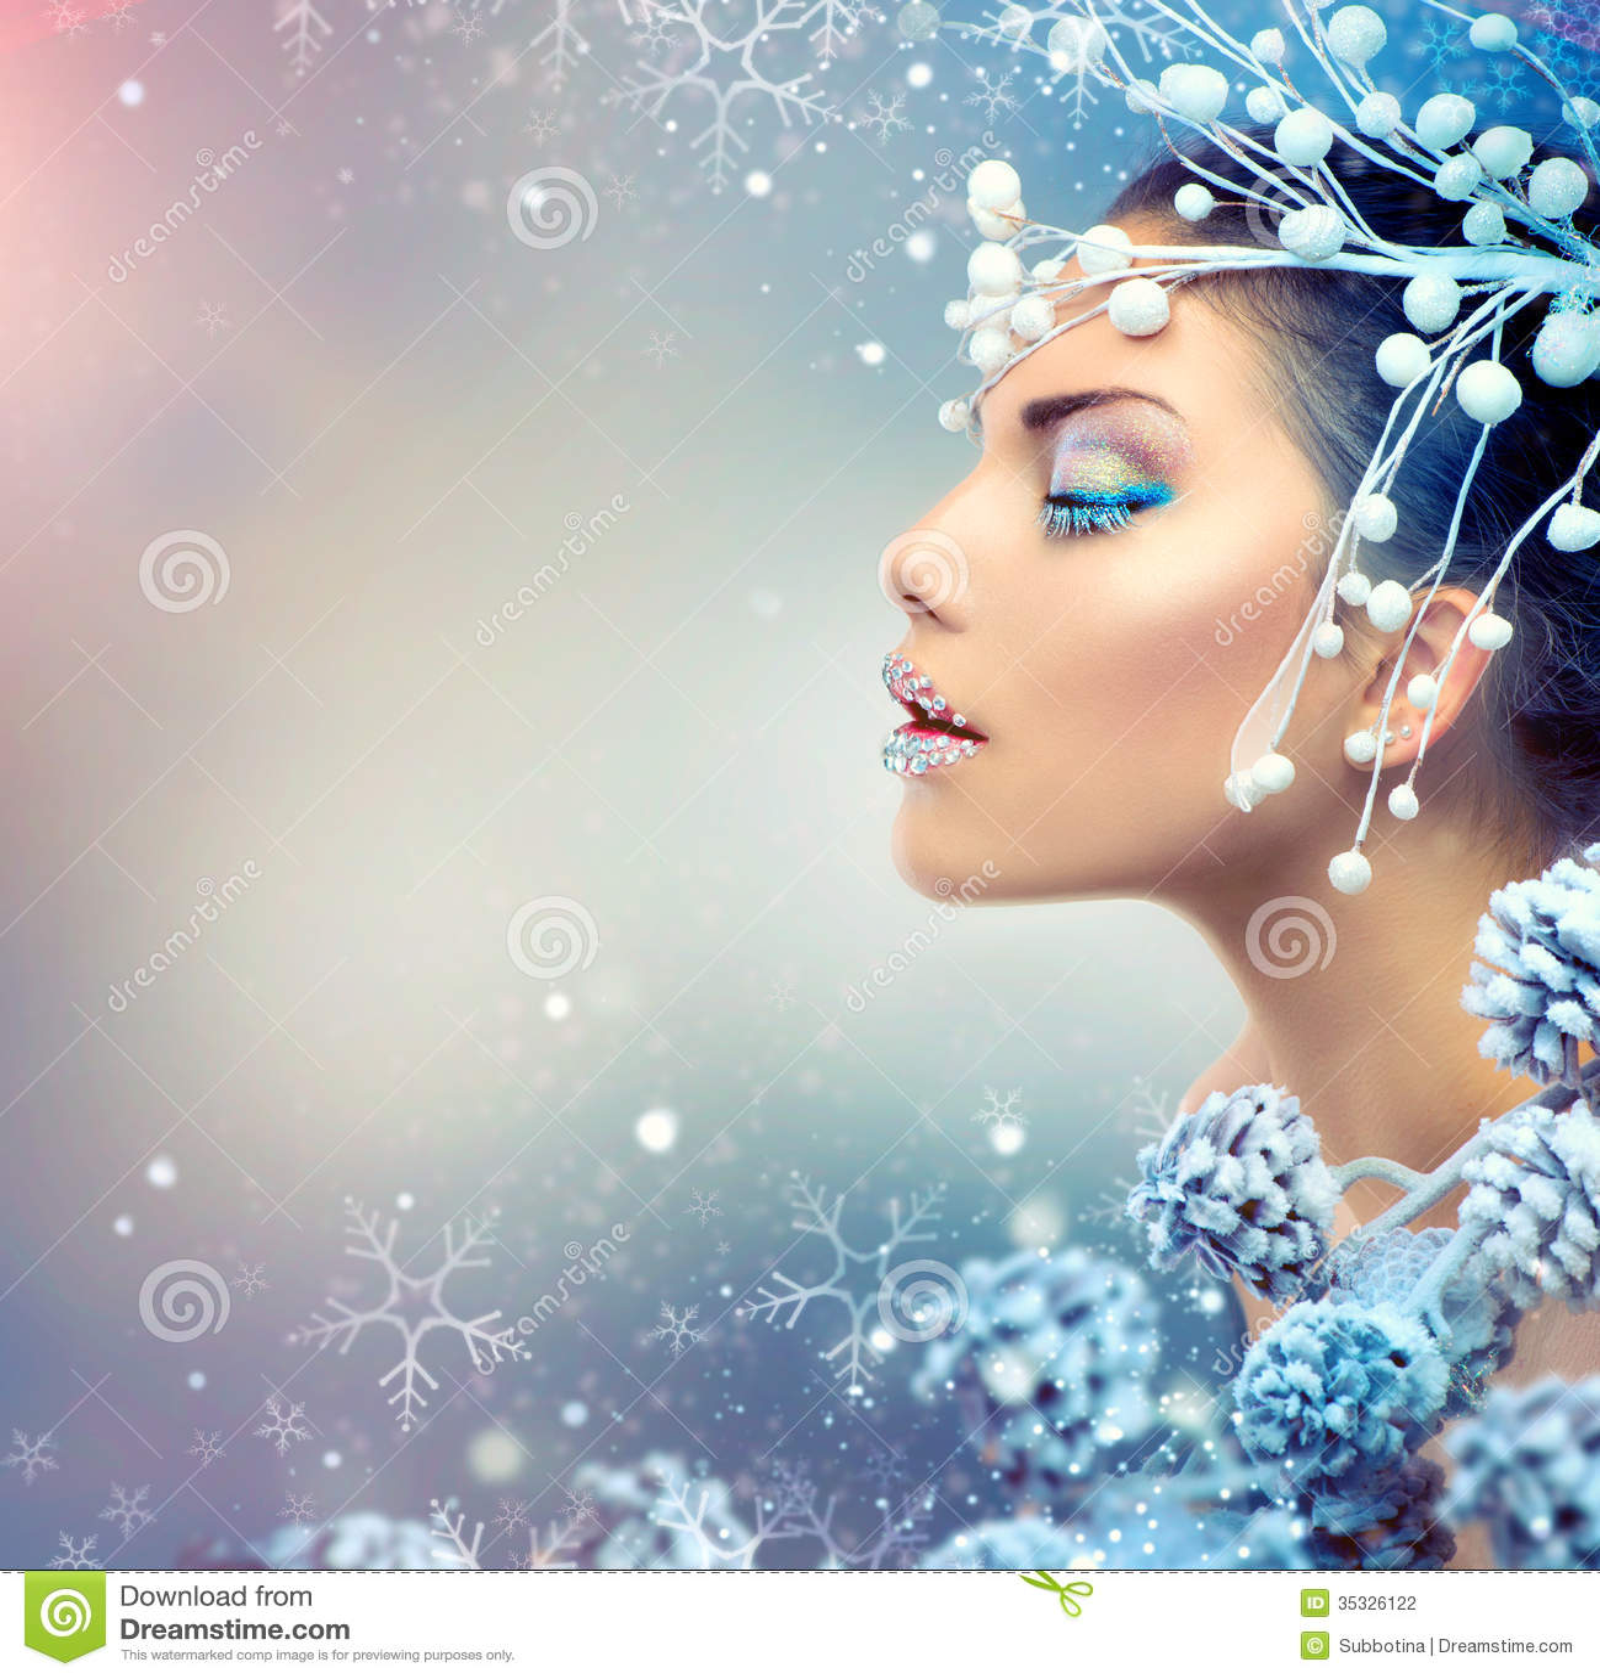 Winter Beauty Woman Stock Photography - Image: 35326122